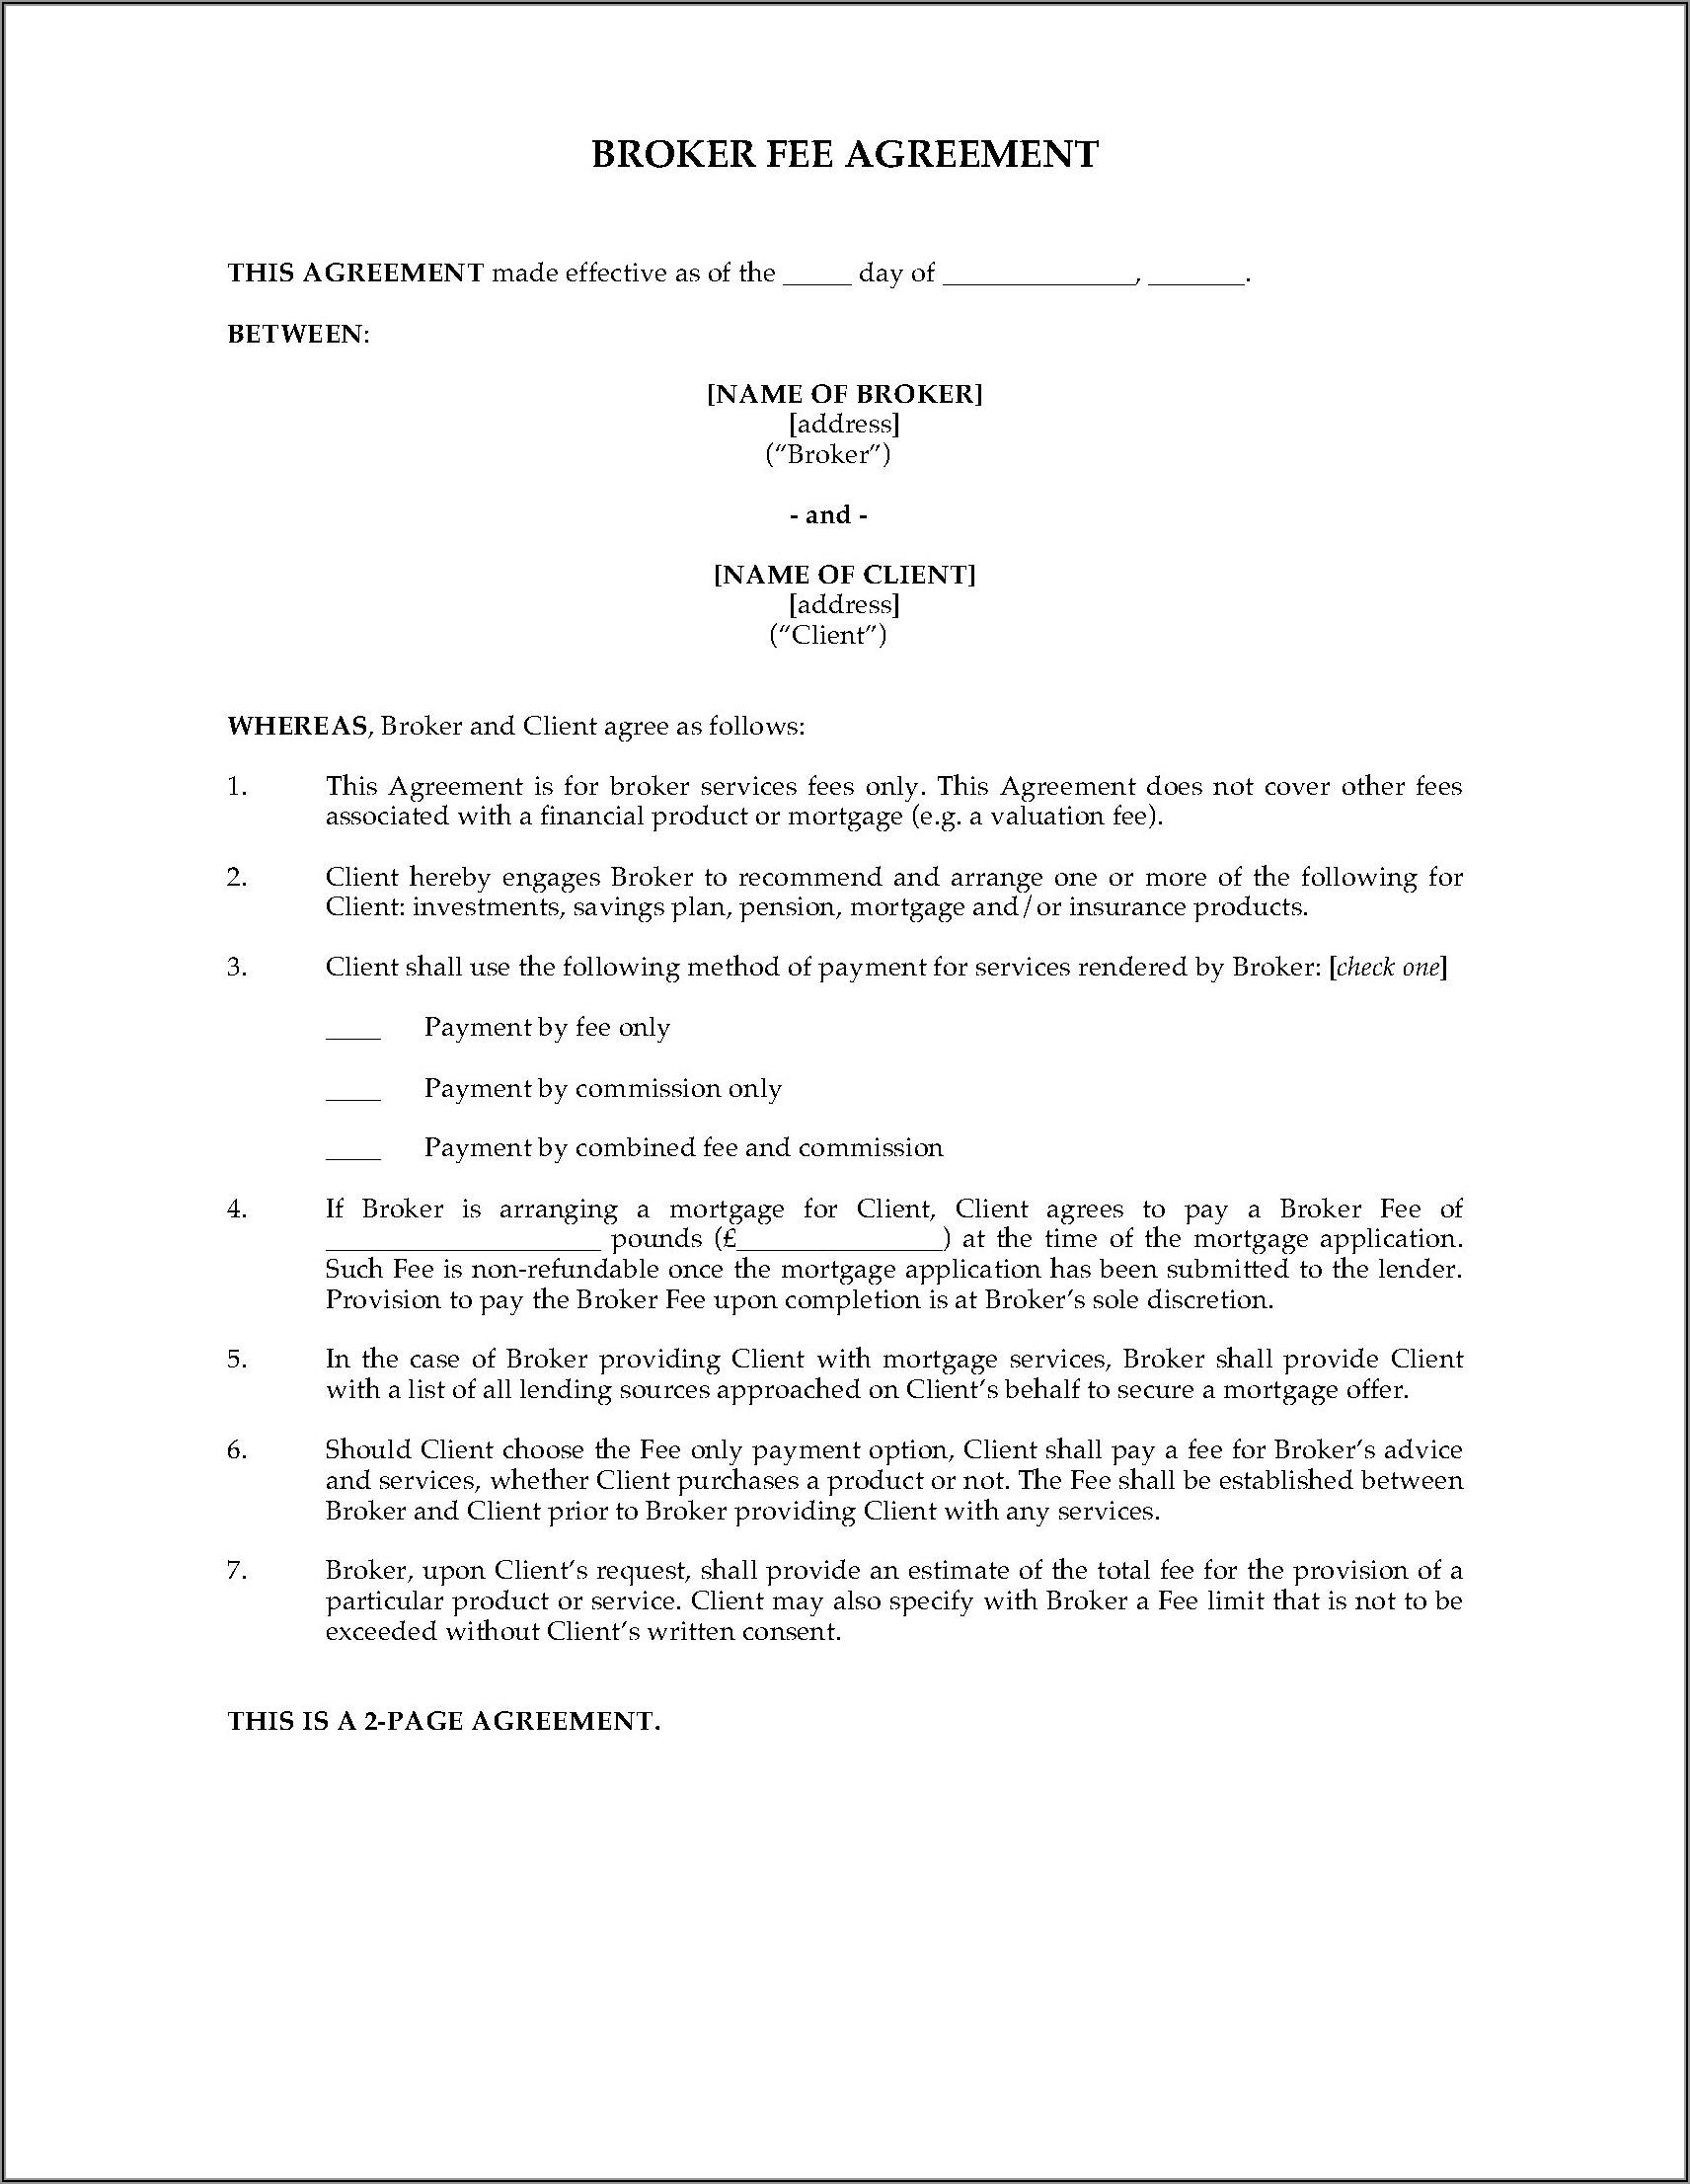 Commercial Loan Broker Agreement Template